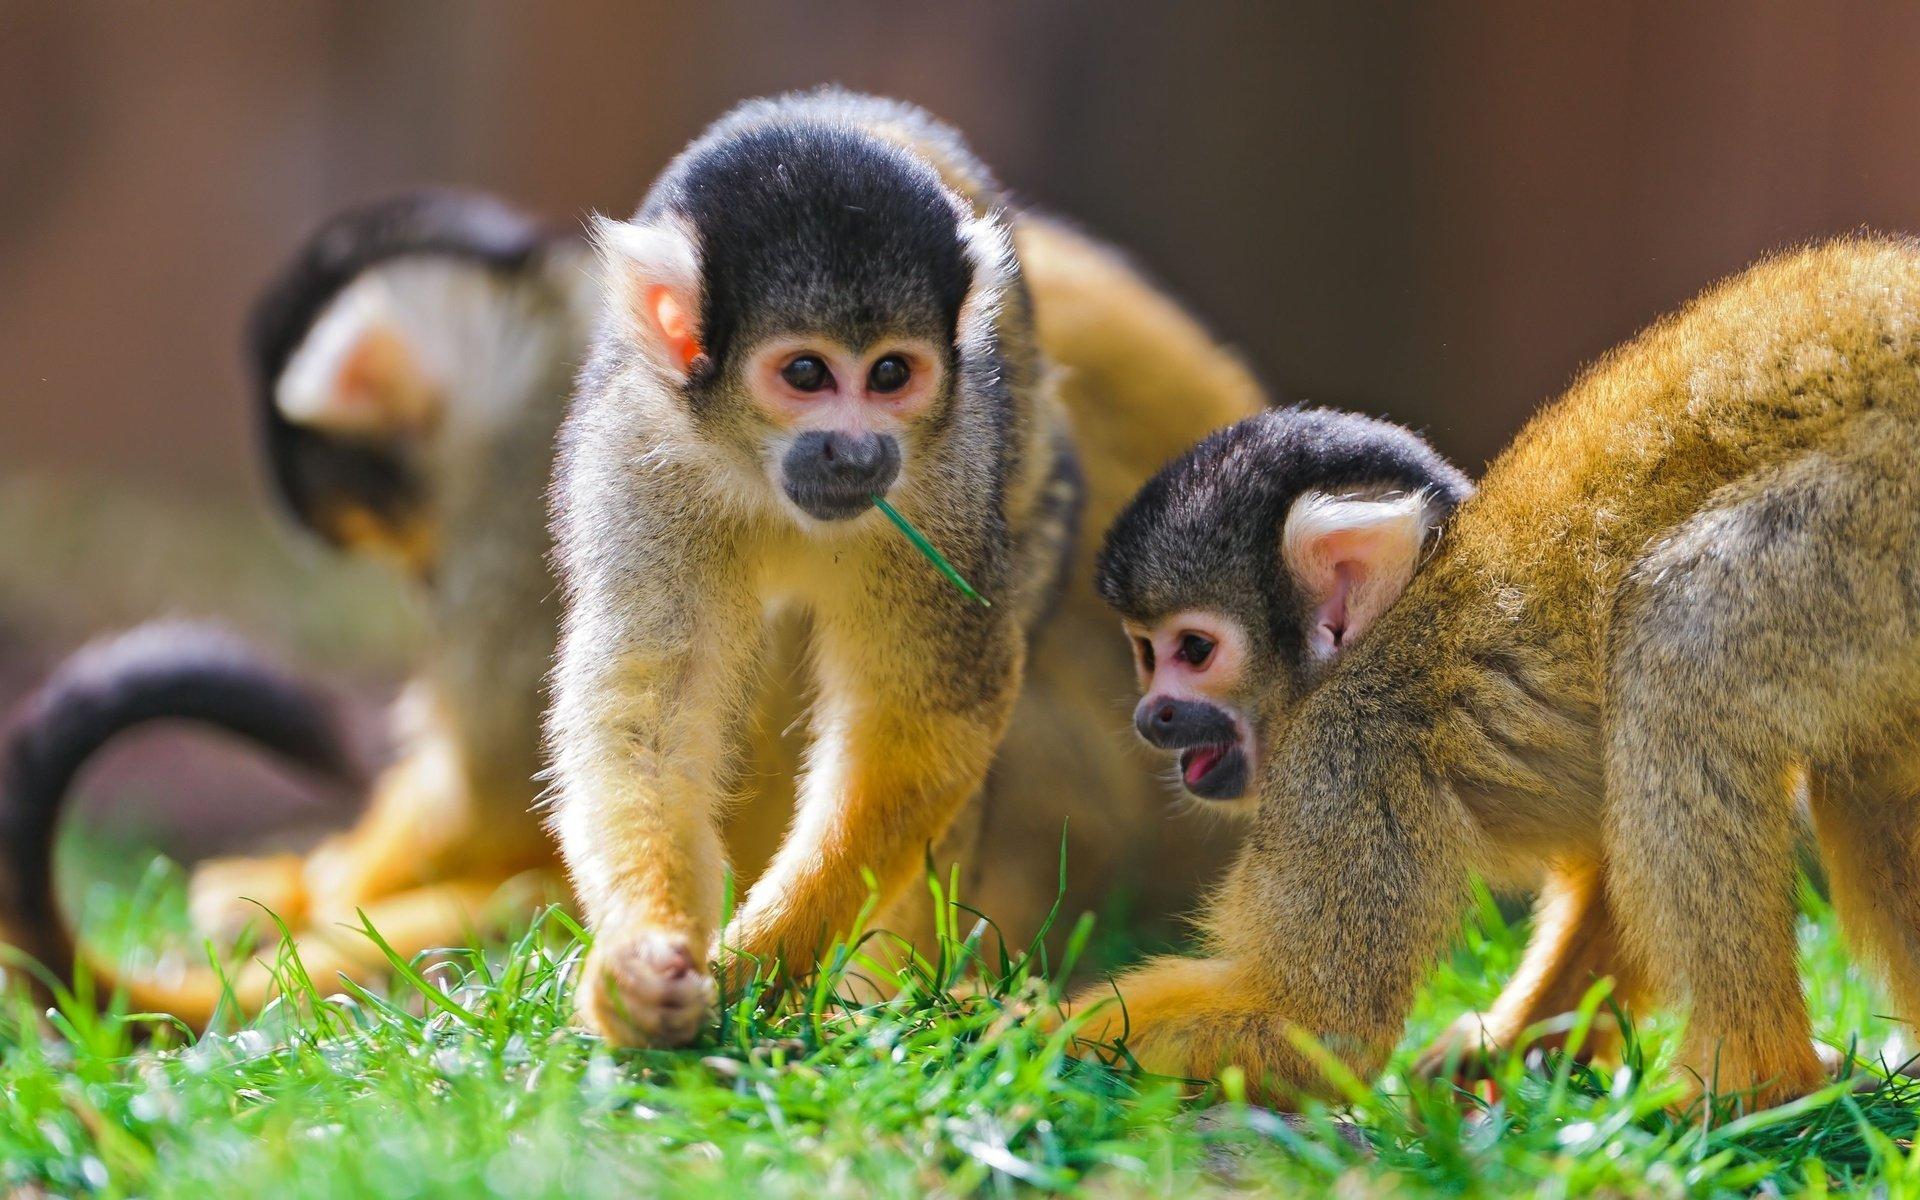 660 Monkeys HD Wallpapers | Backgrounds - Wallpaper Abyss